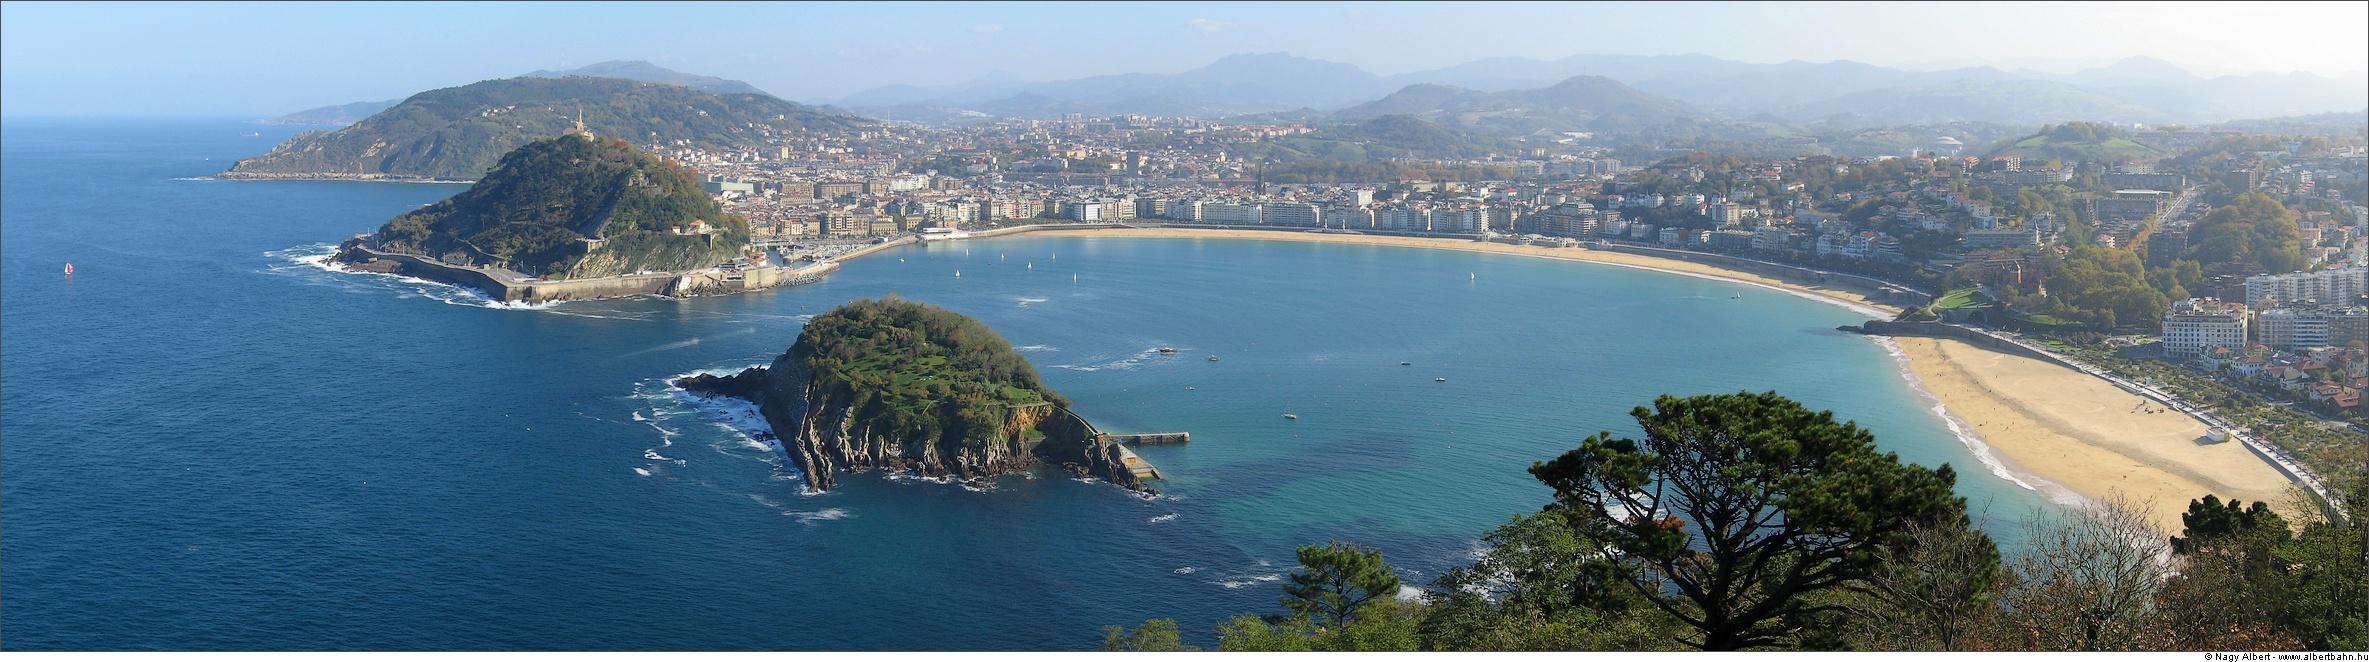 Foto playa Ondarreta. San Sebastian panorama - from Monte Igueldo